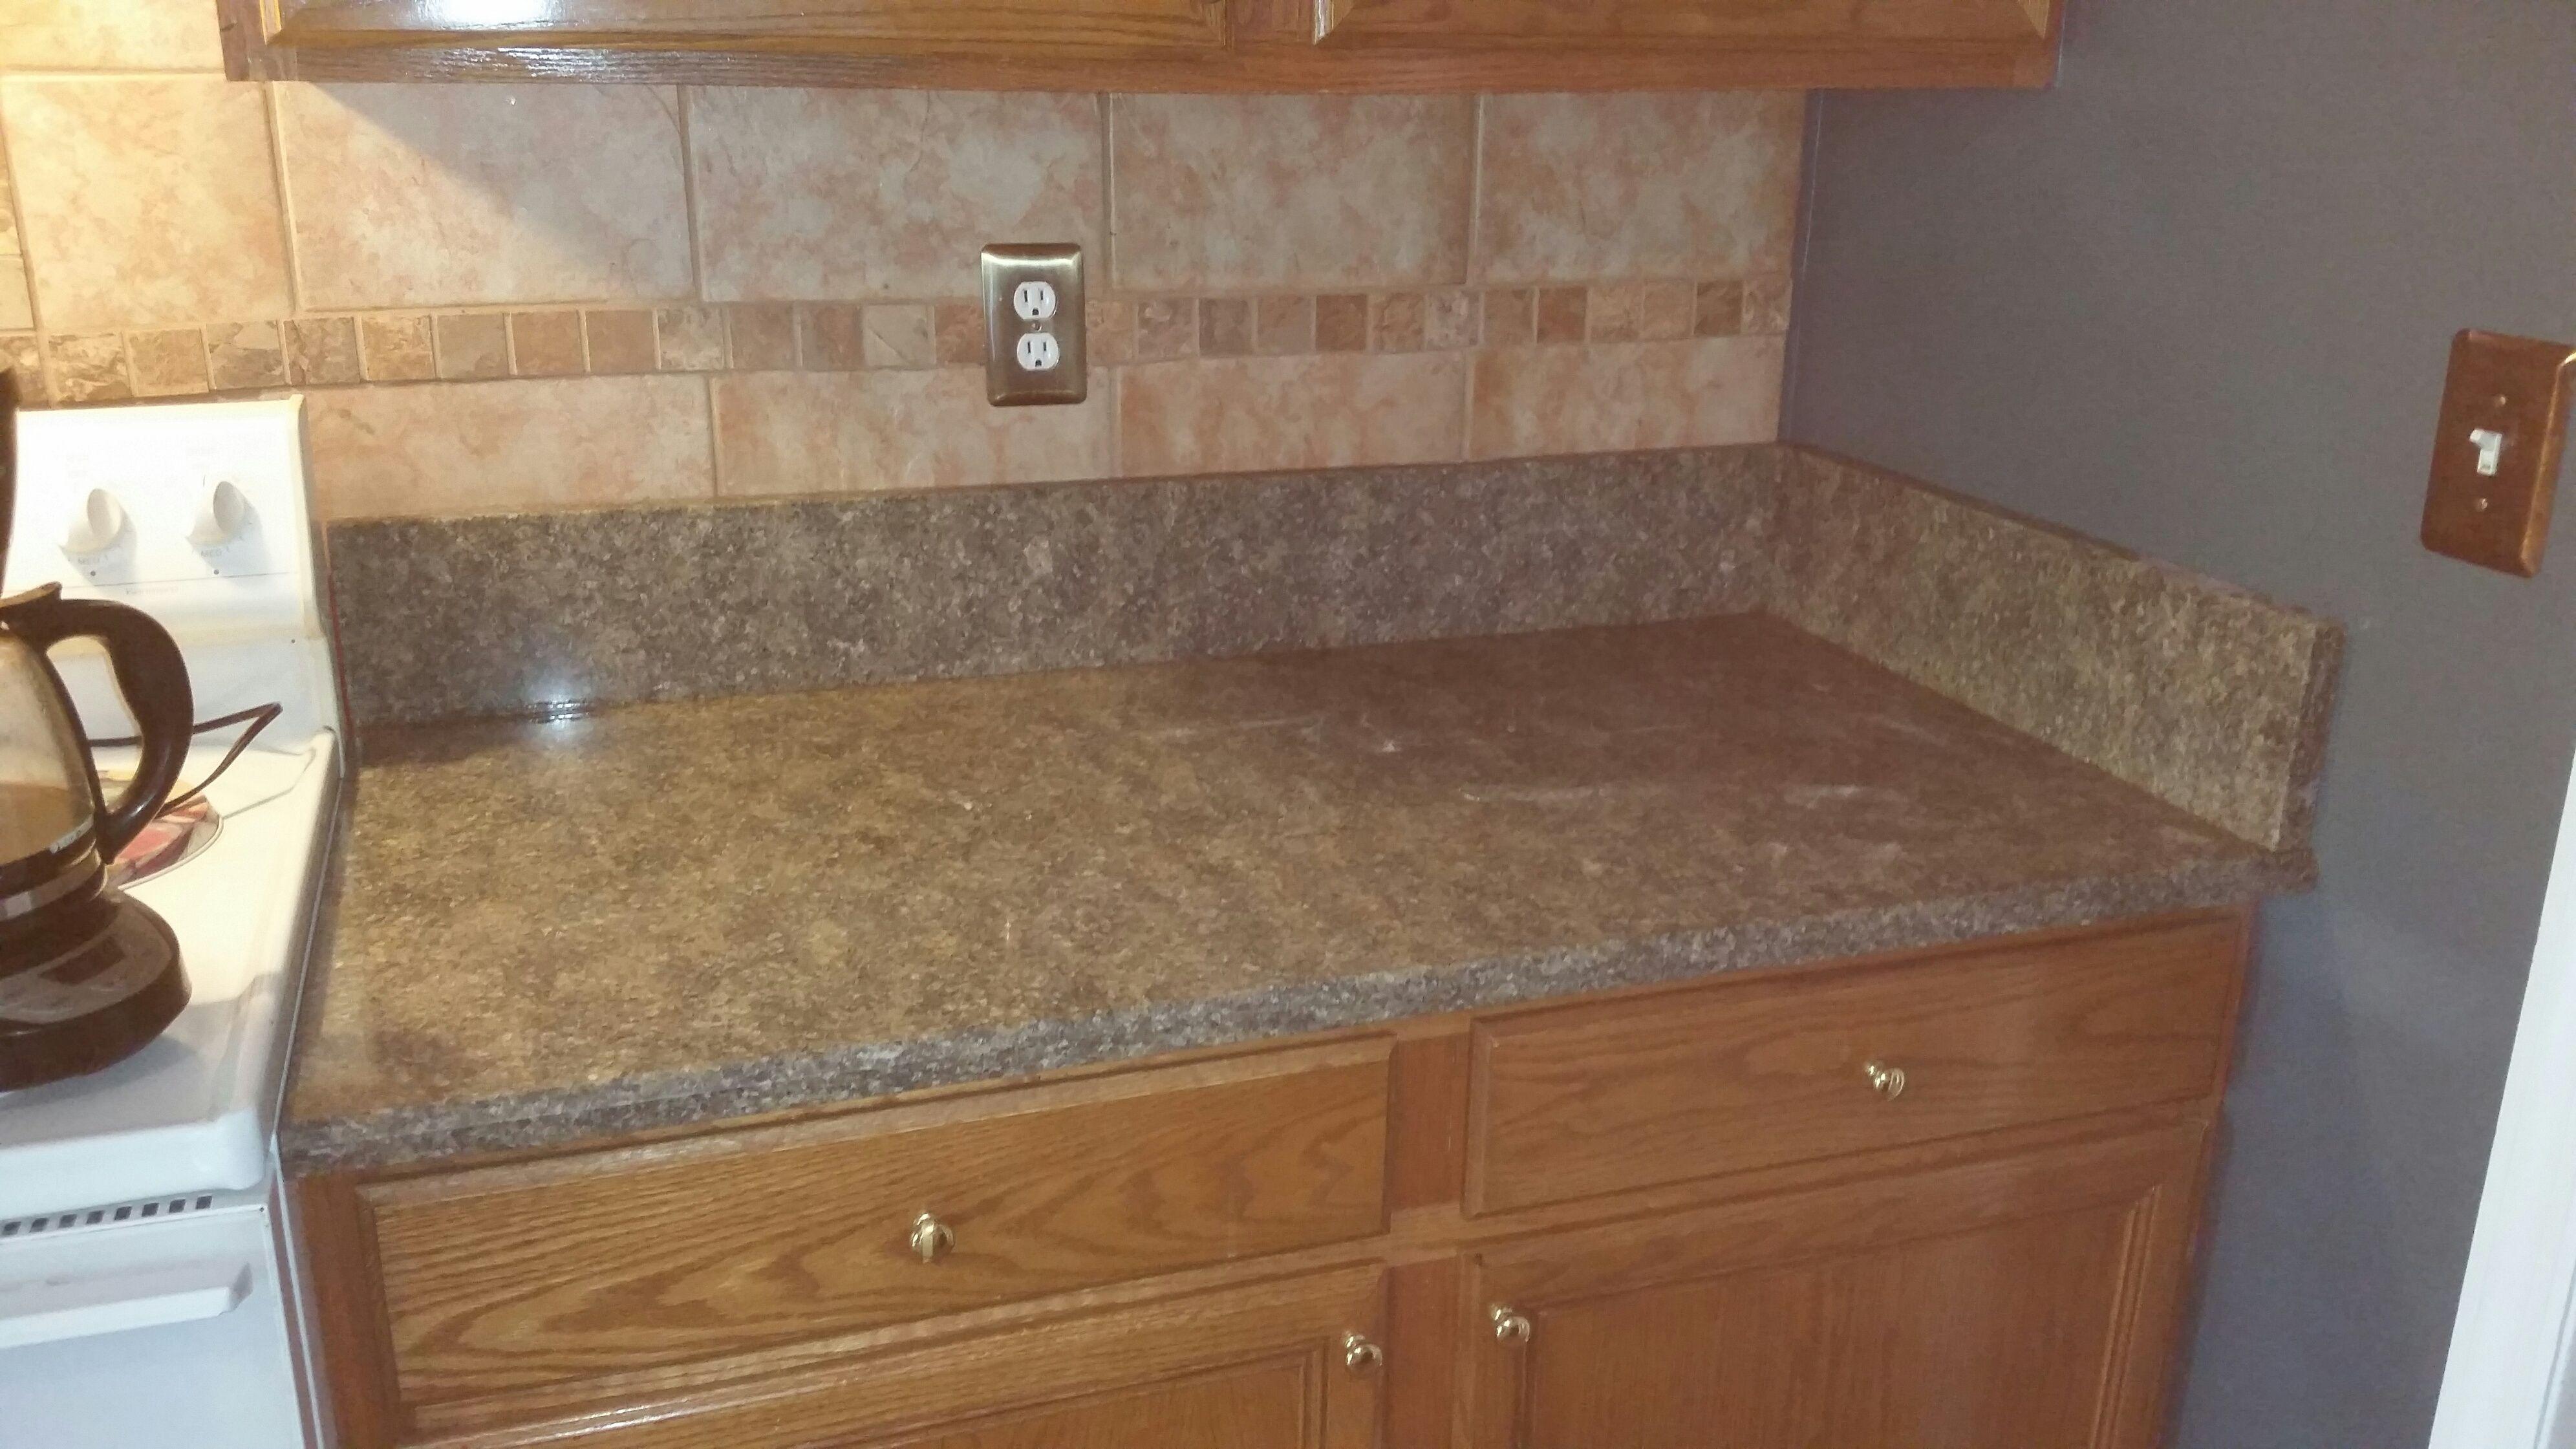 Wildwood Lg Viatera Quartz Kitchen Countertop Install For Buuck Knoxville 39 S Stone Interiors